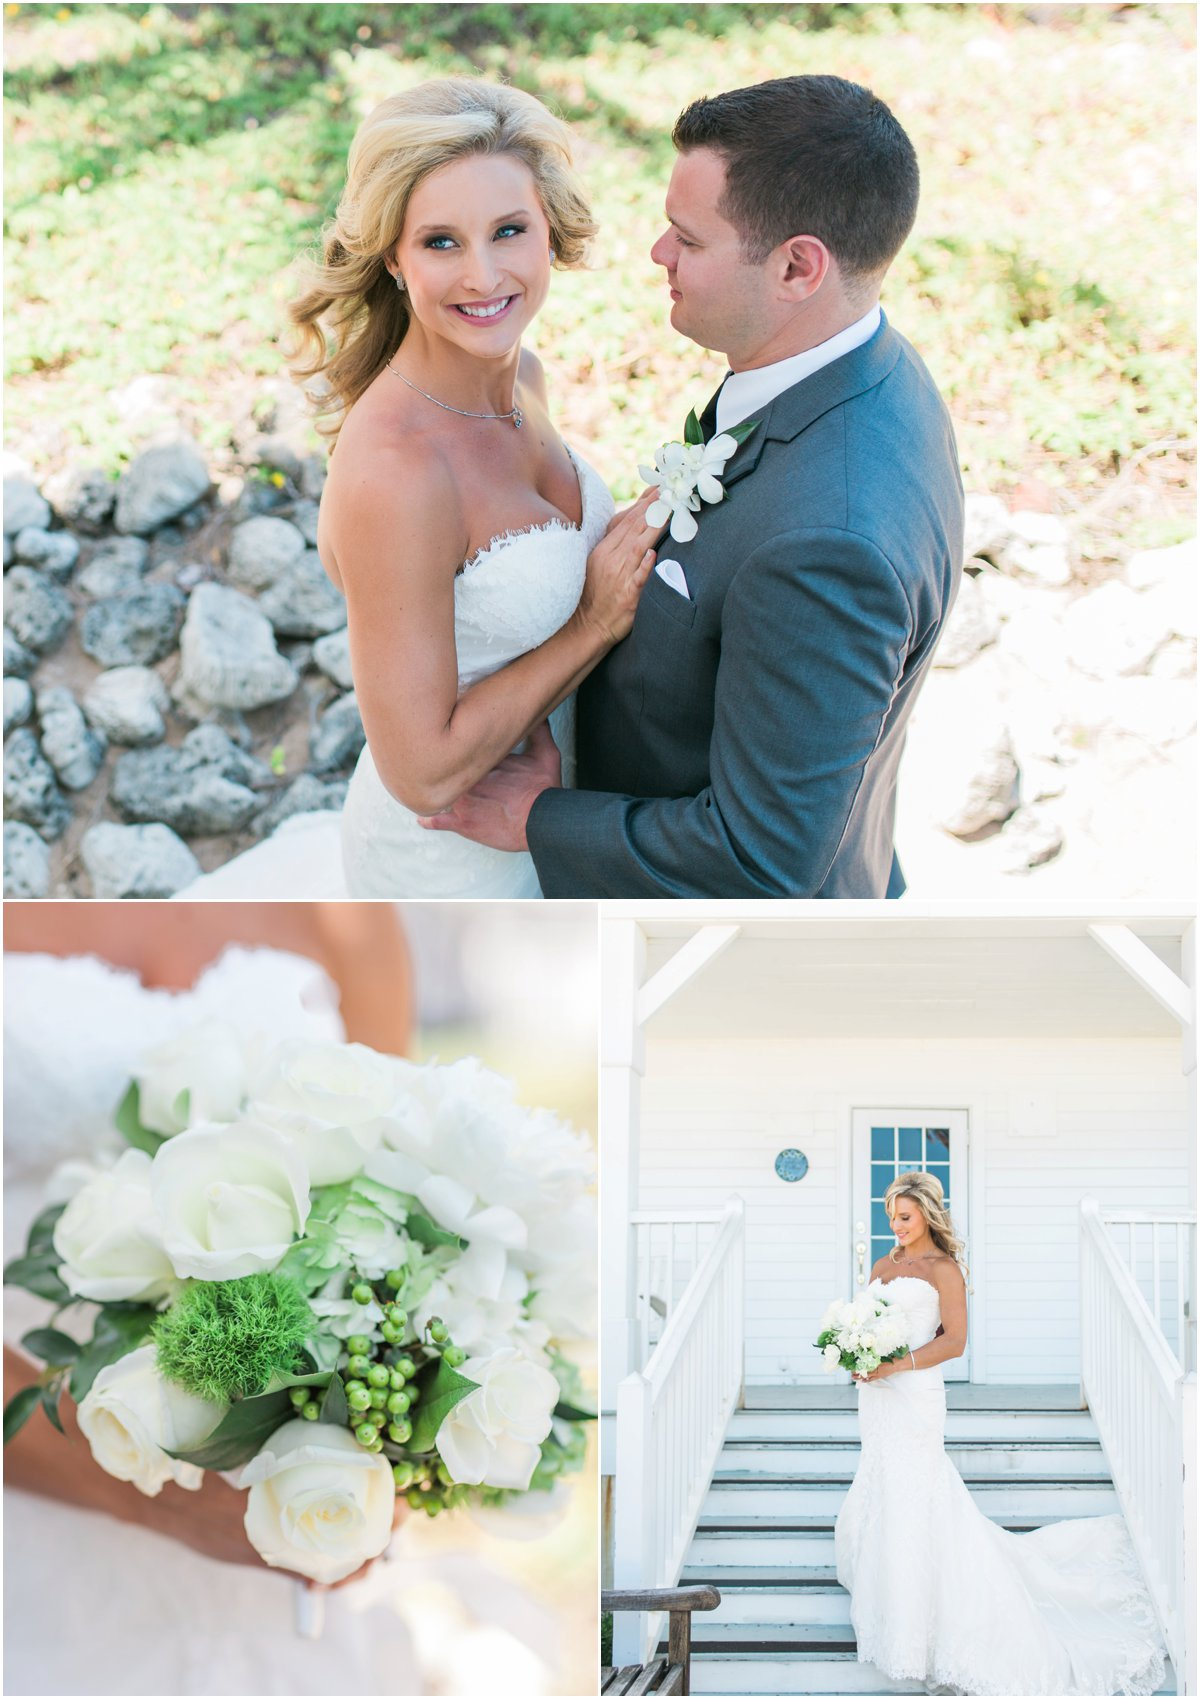 South-Florida-Wedding-Photographer-Hillsboro-lighthouse_0009